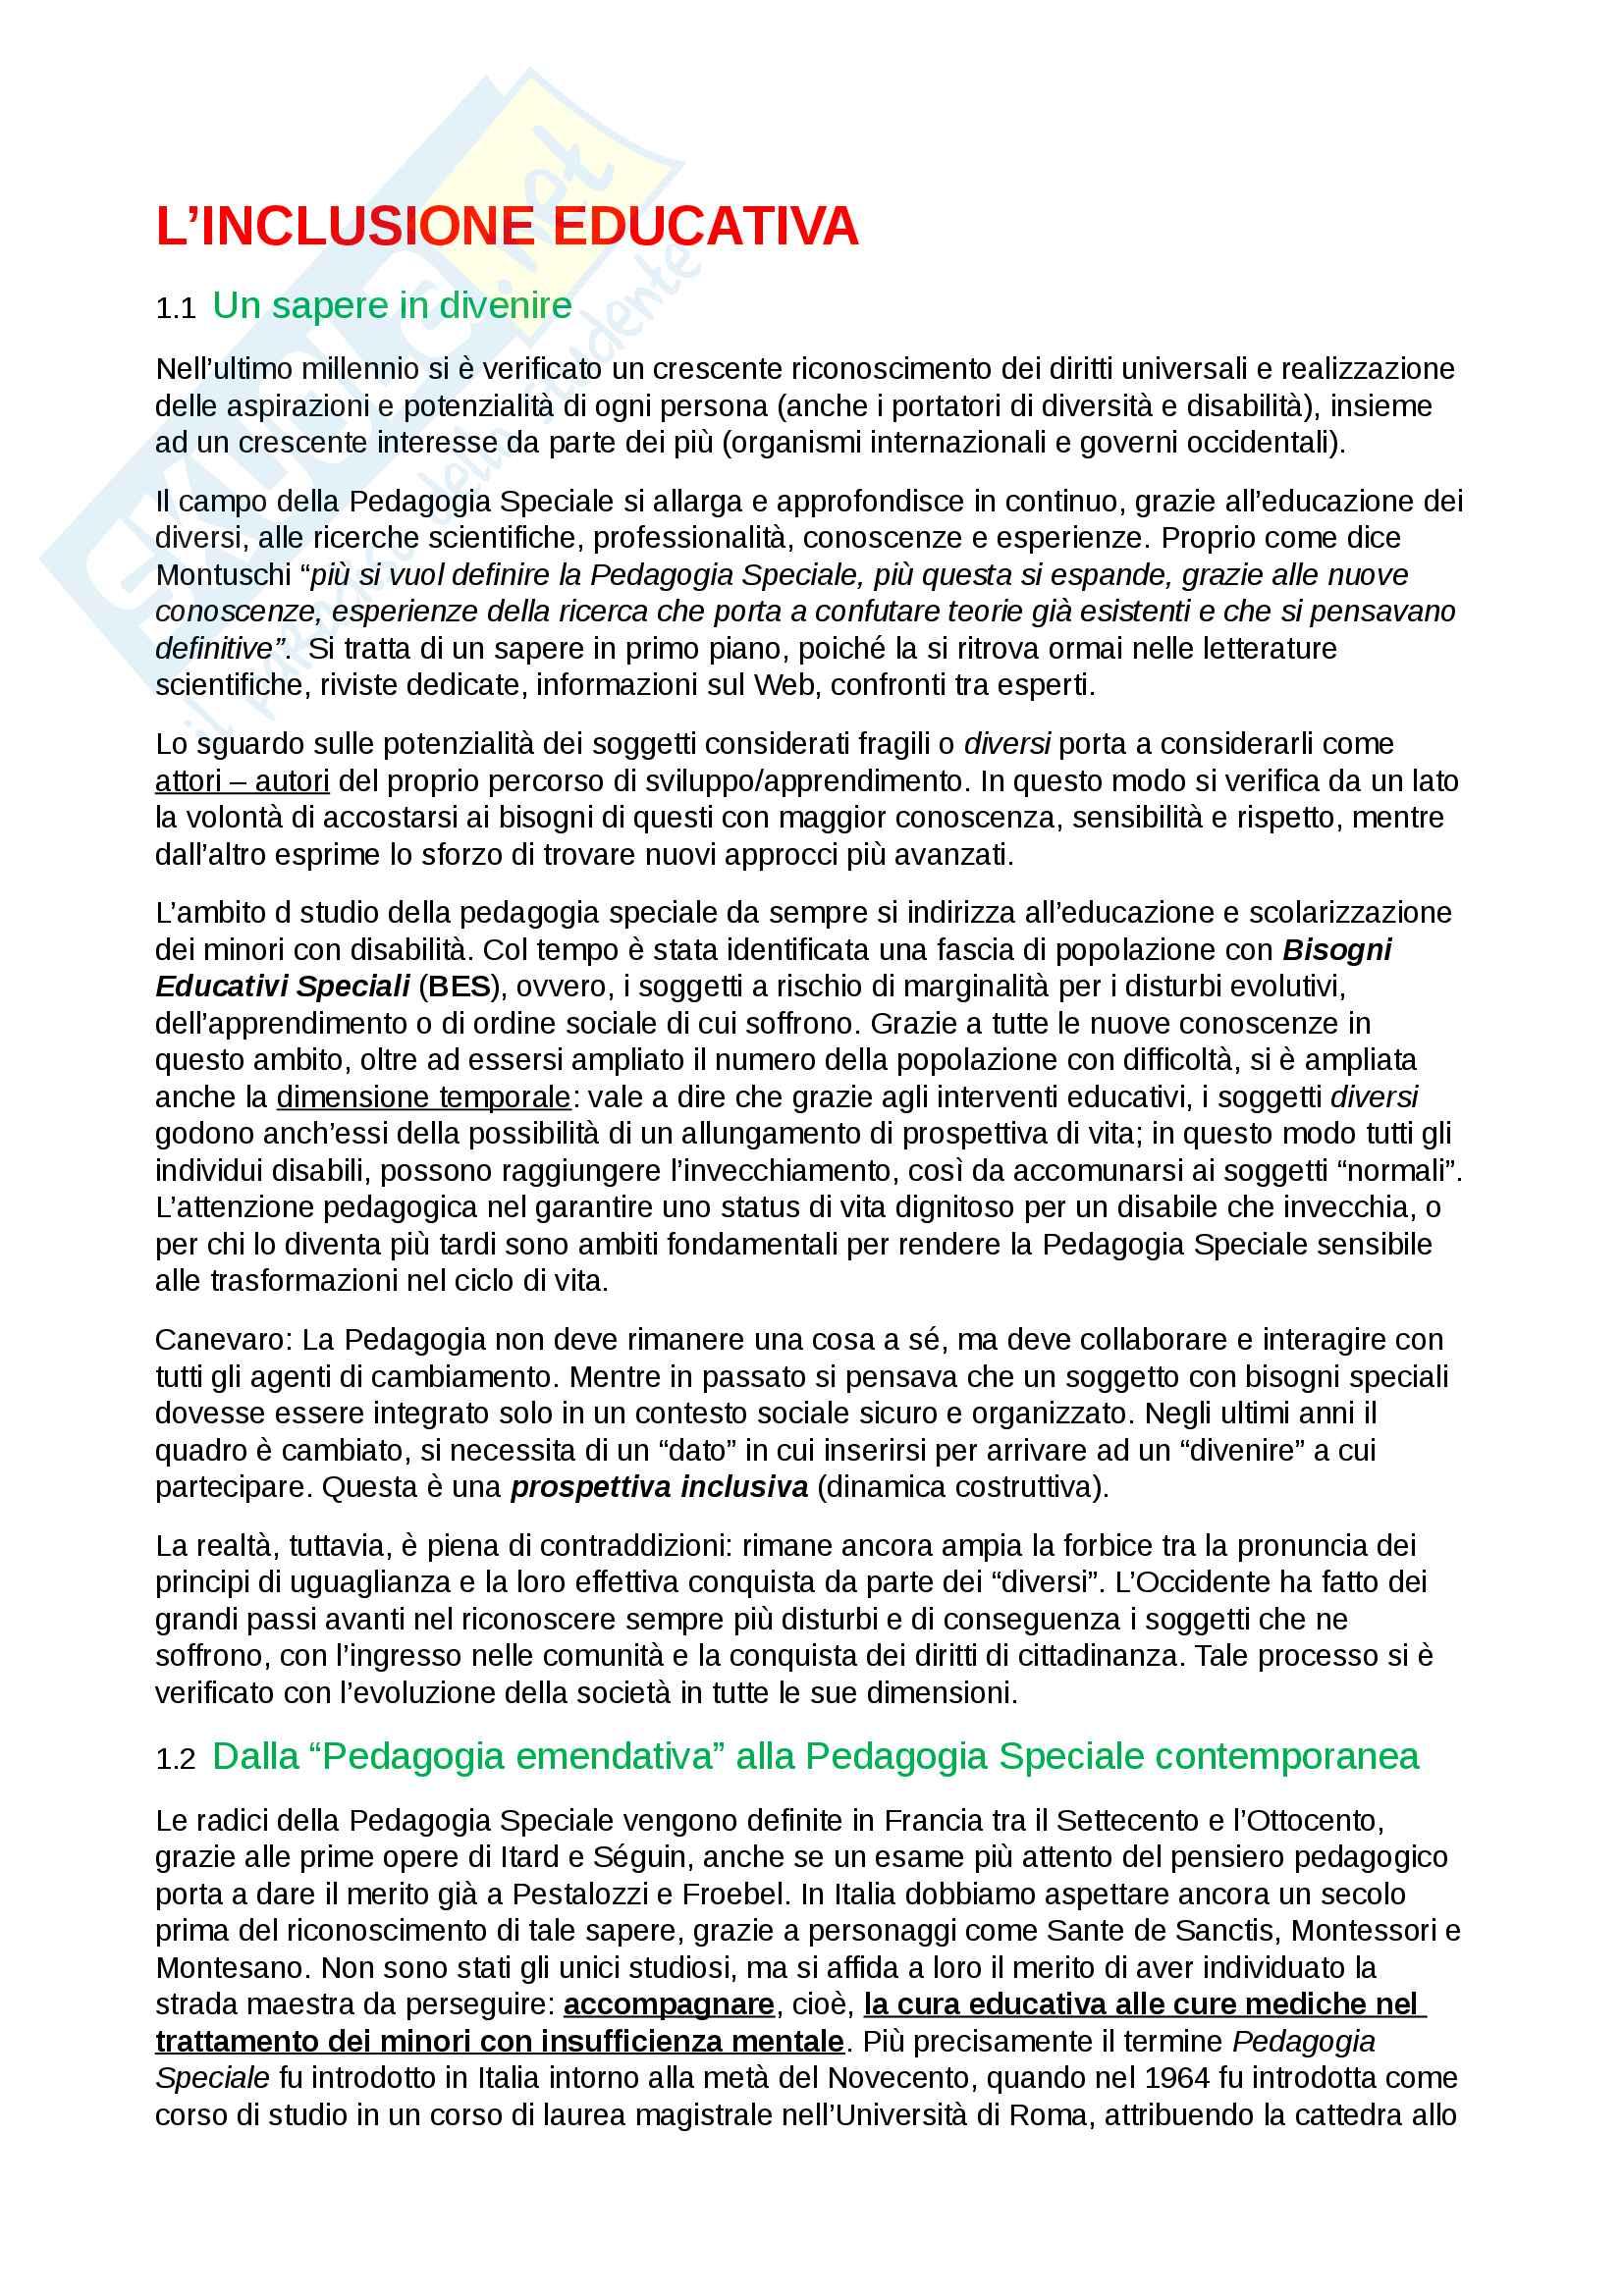 Riassunto esame pedagogia speciale,prof. Pavone, libro consigliato Inclusione Educativa, Pavone